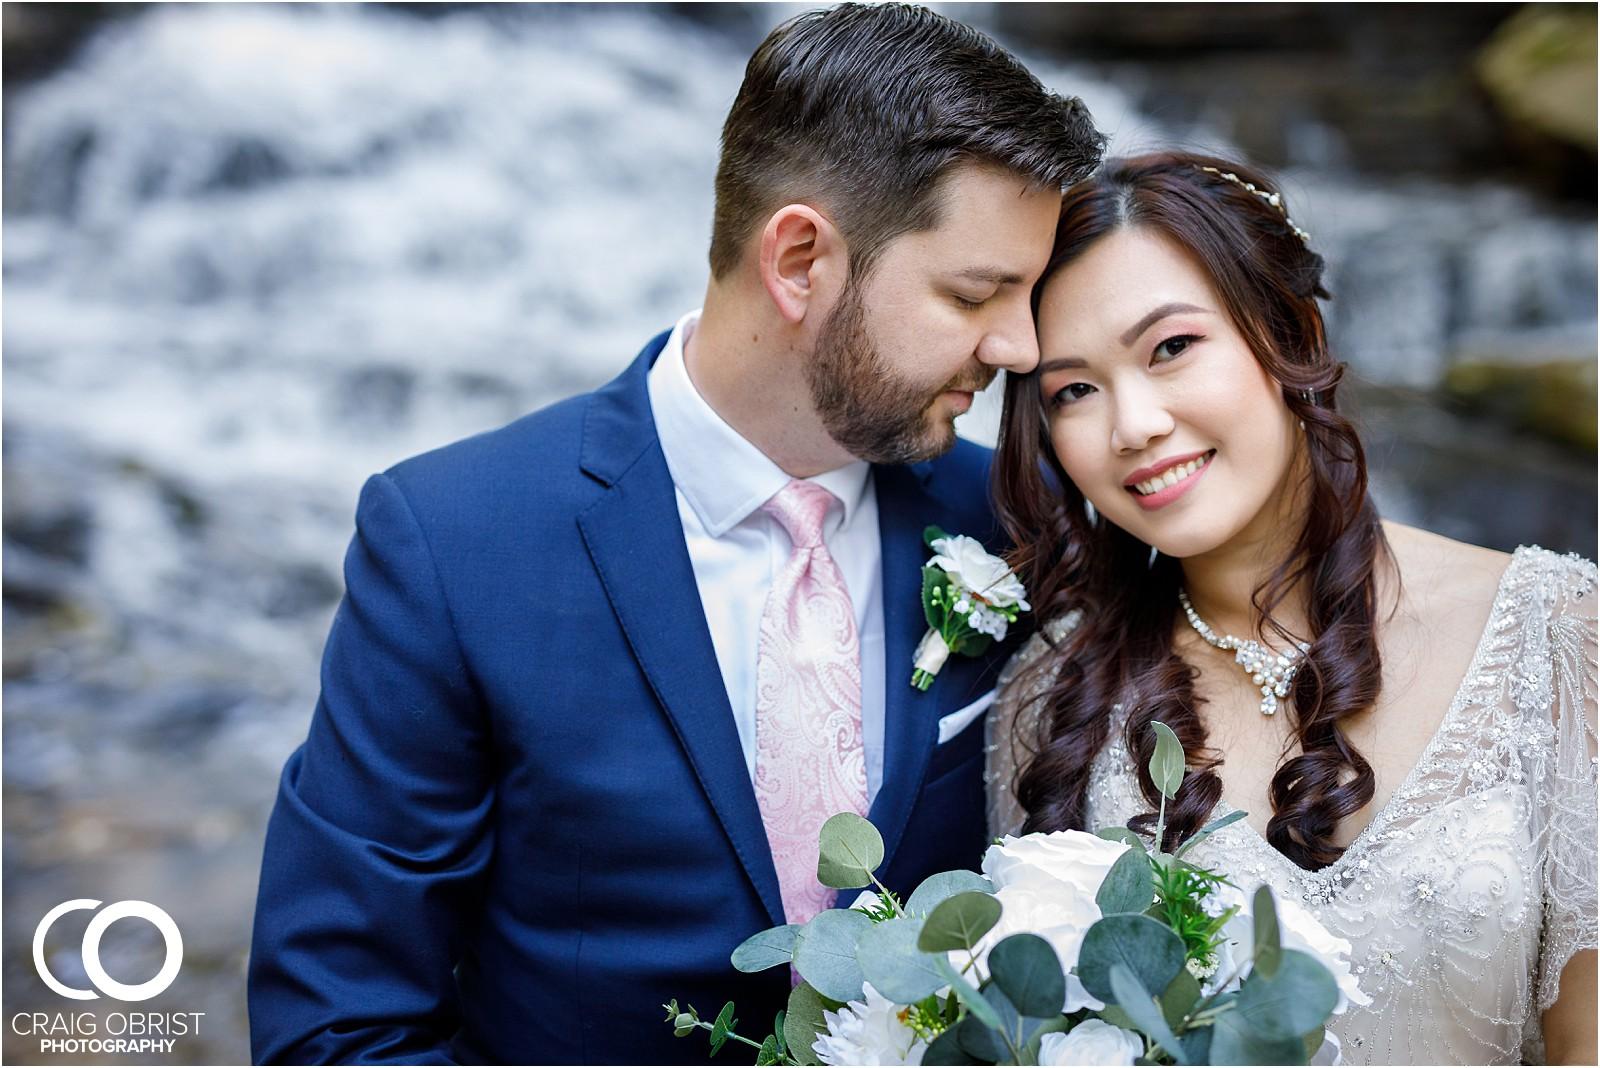 Waterfall Wedding Portraits Elopement Georgia_0005.jpg